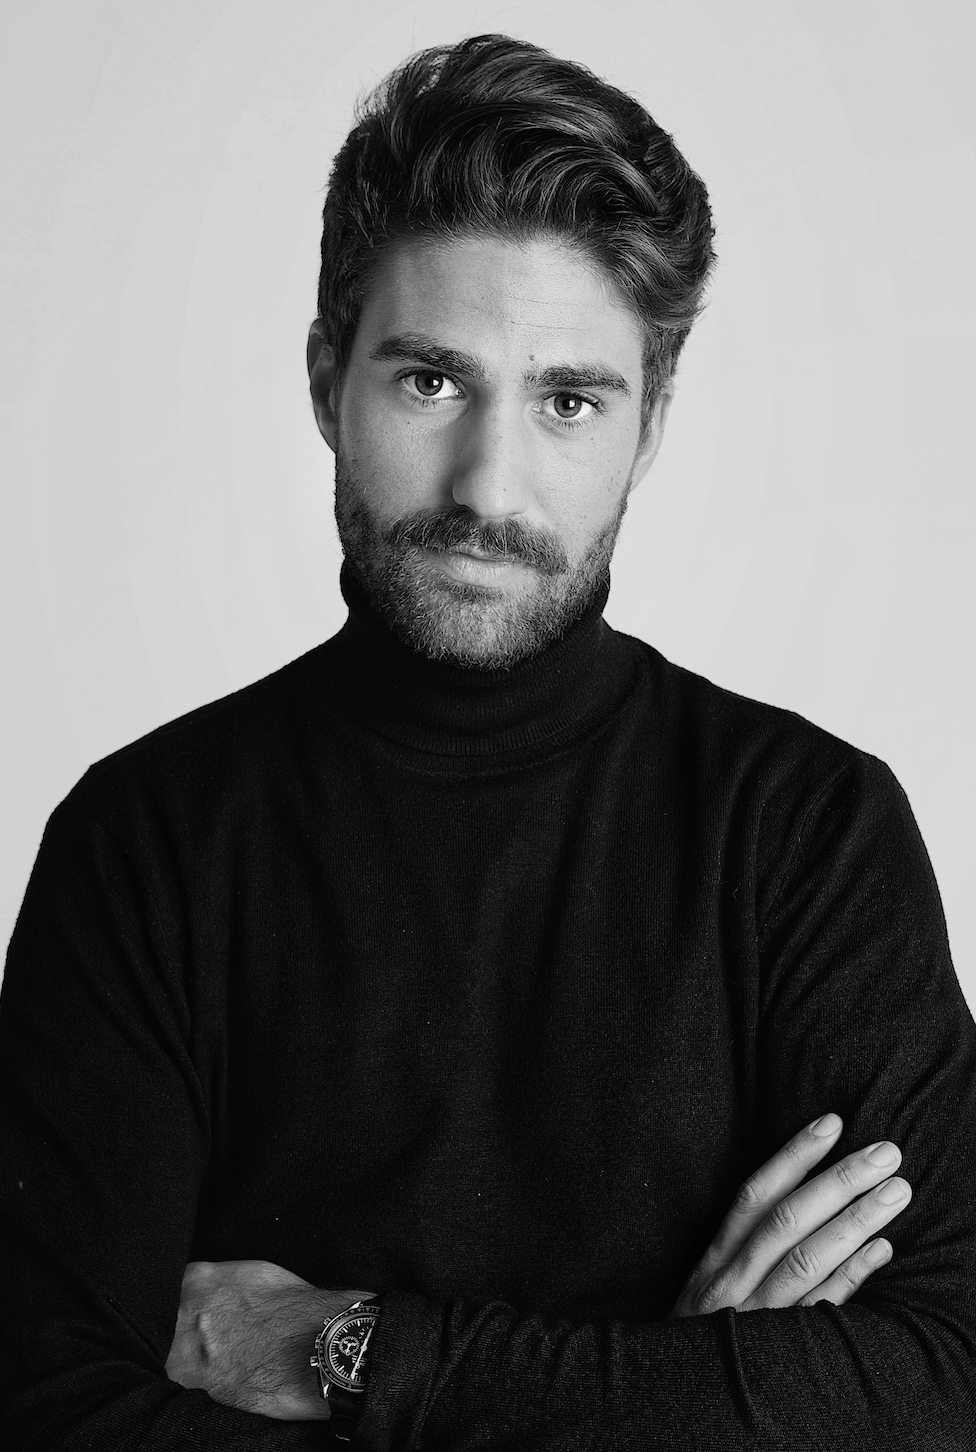 Alessandro Lovisetto, Artknit Studios